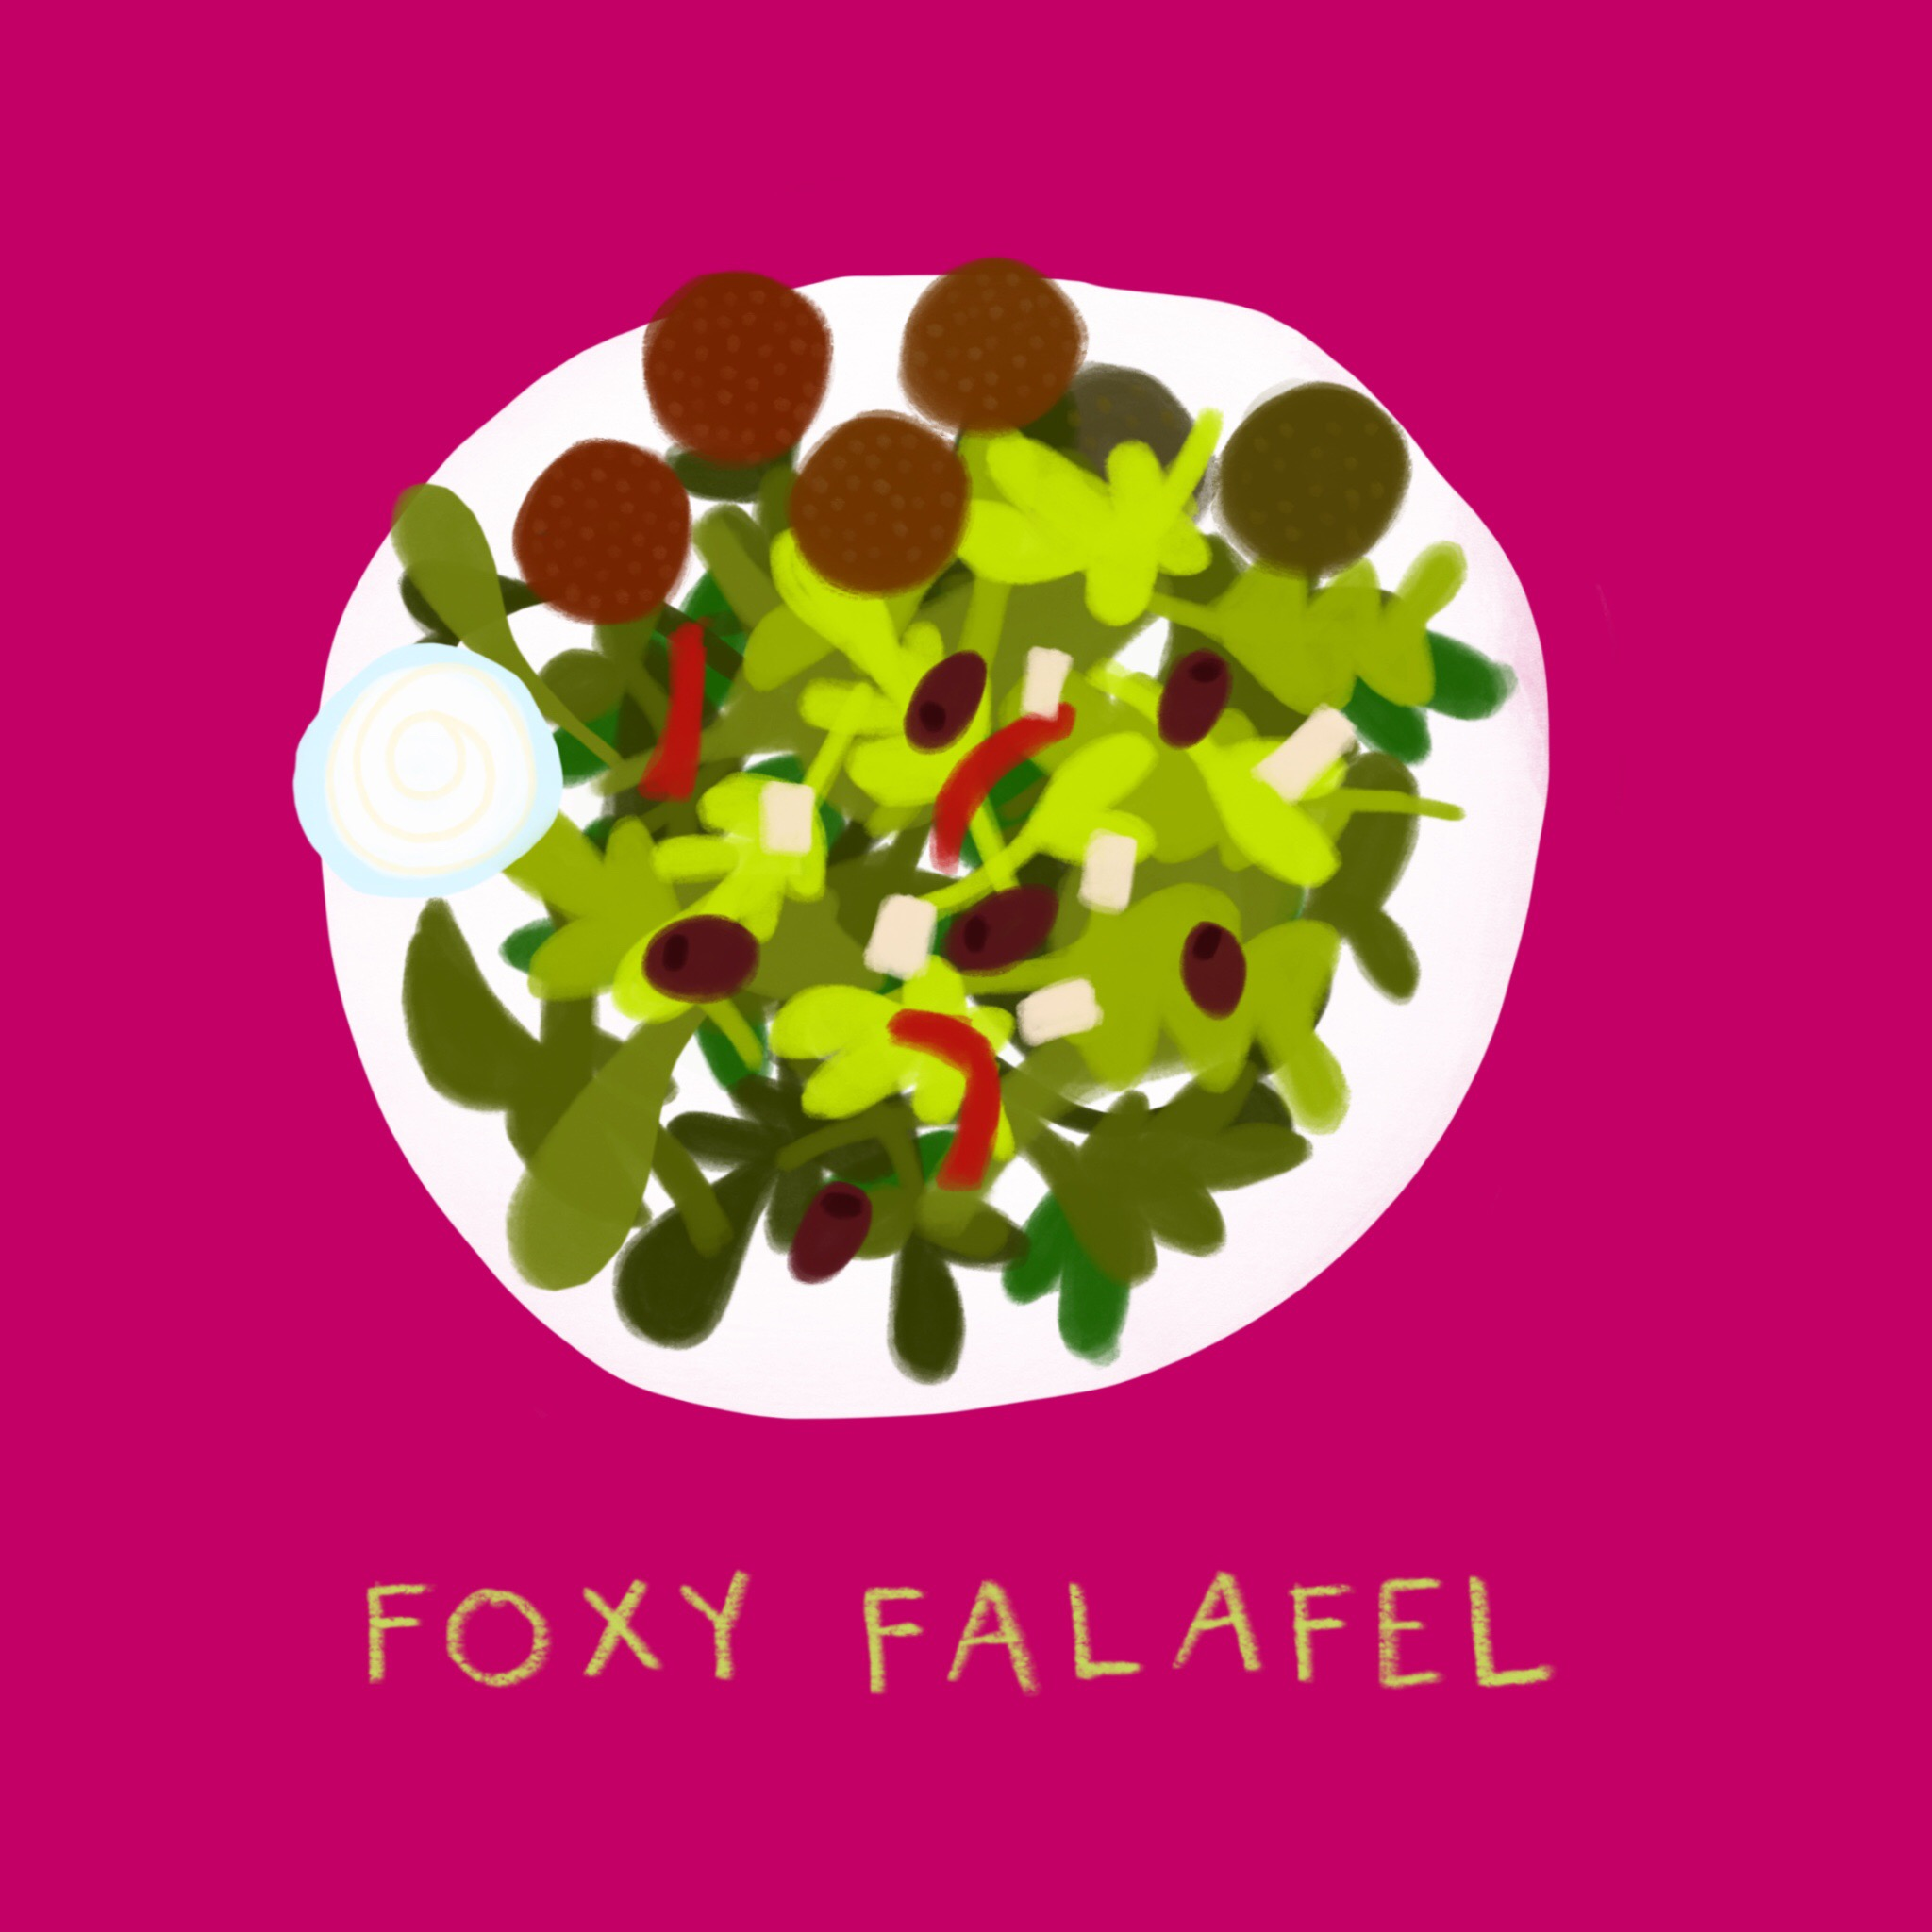 55_-_Foxy_Falafel.jpg